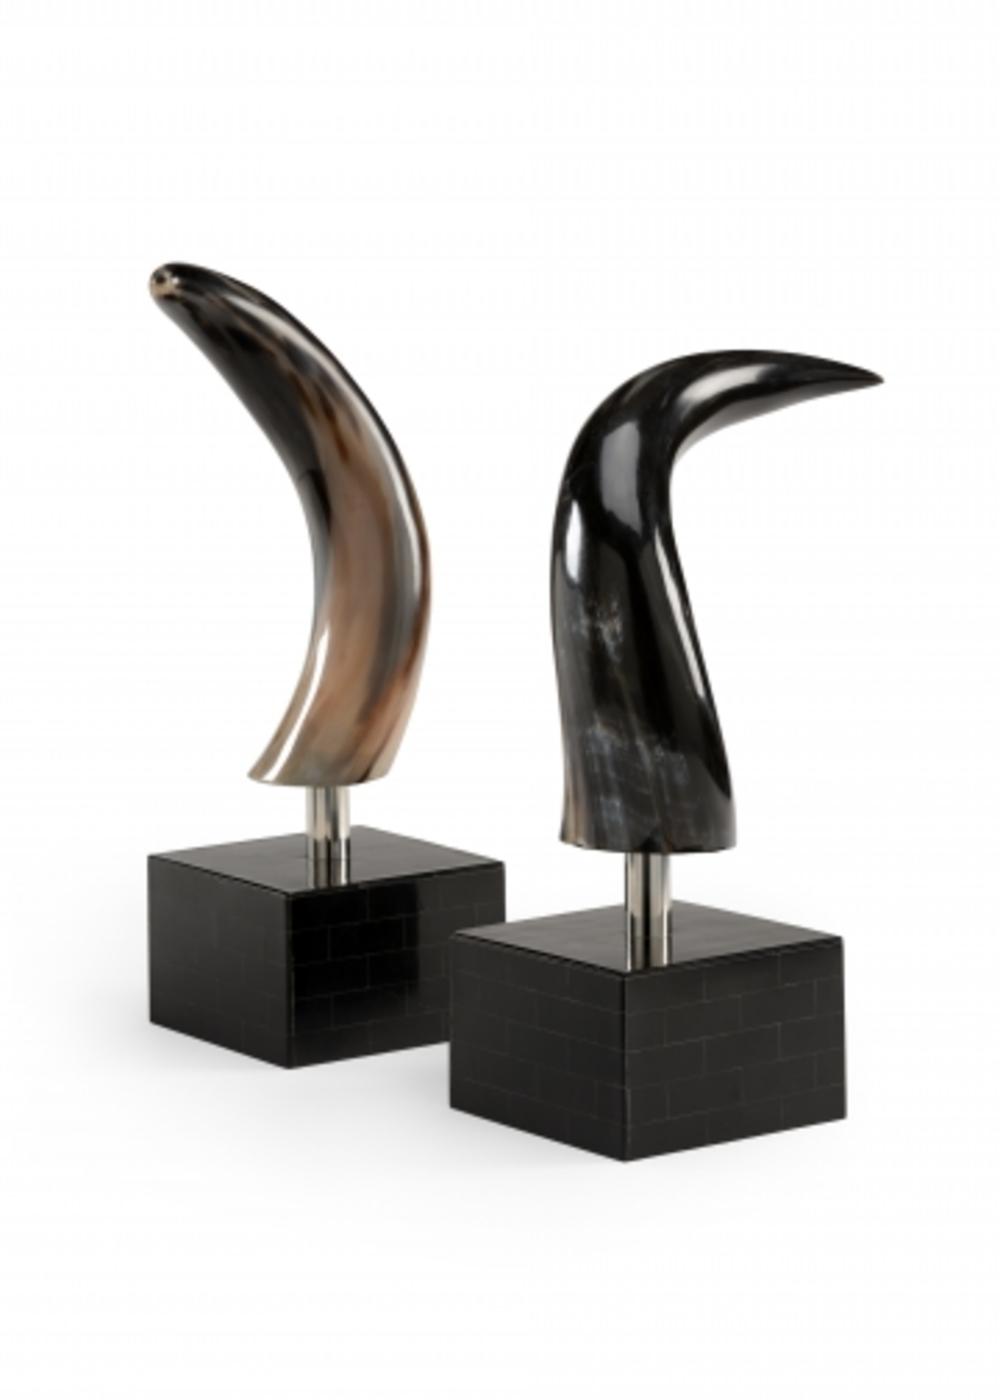 Wildwood Lamp - Mounted Buffalo Horn Bookends